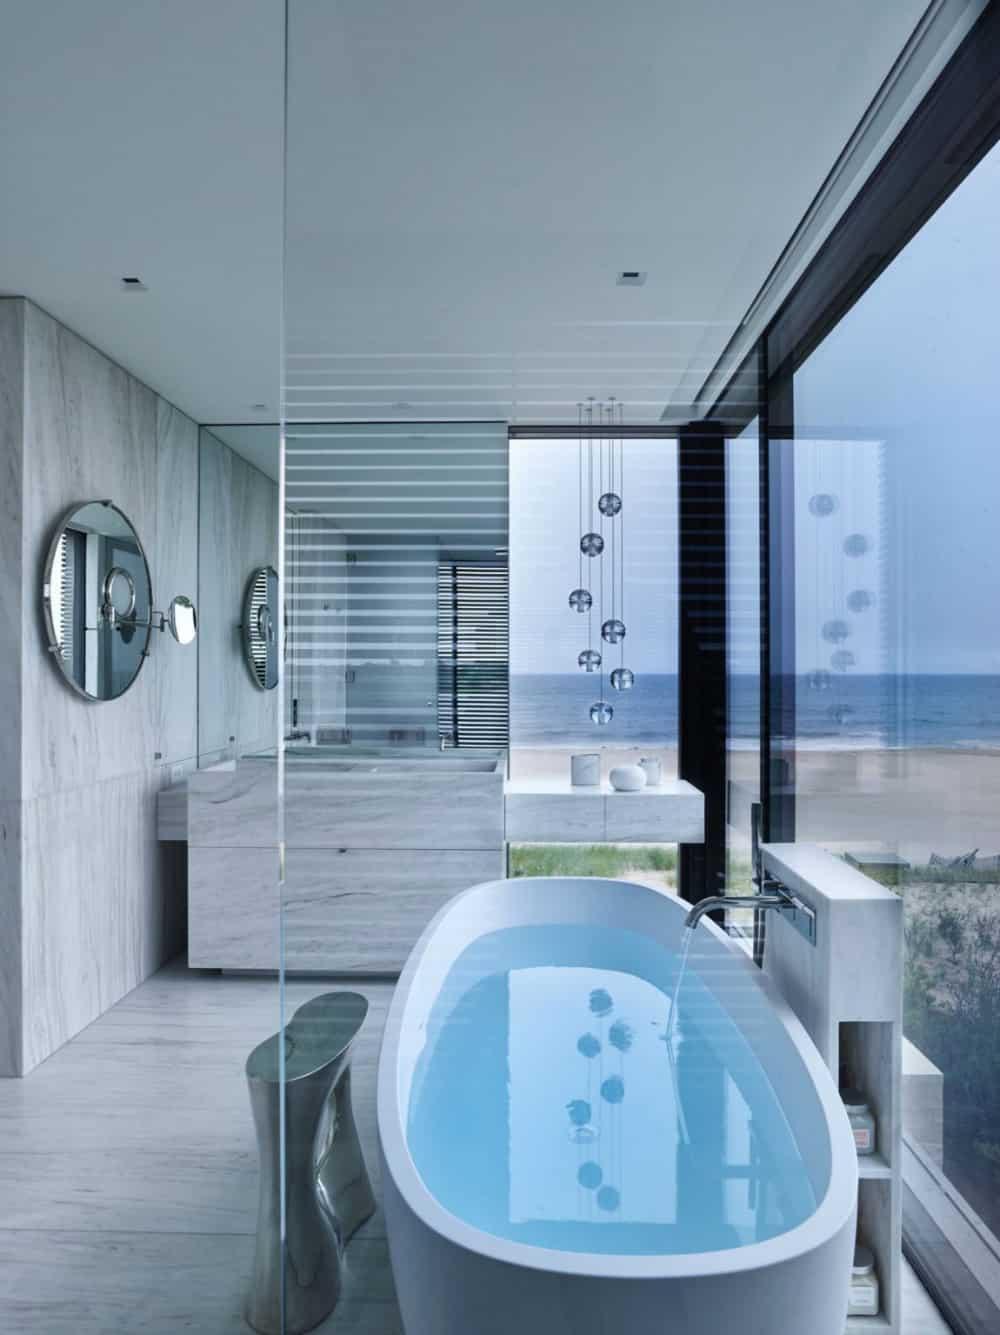 Even bathroom enjoys views of the ocean